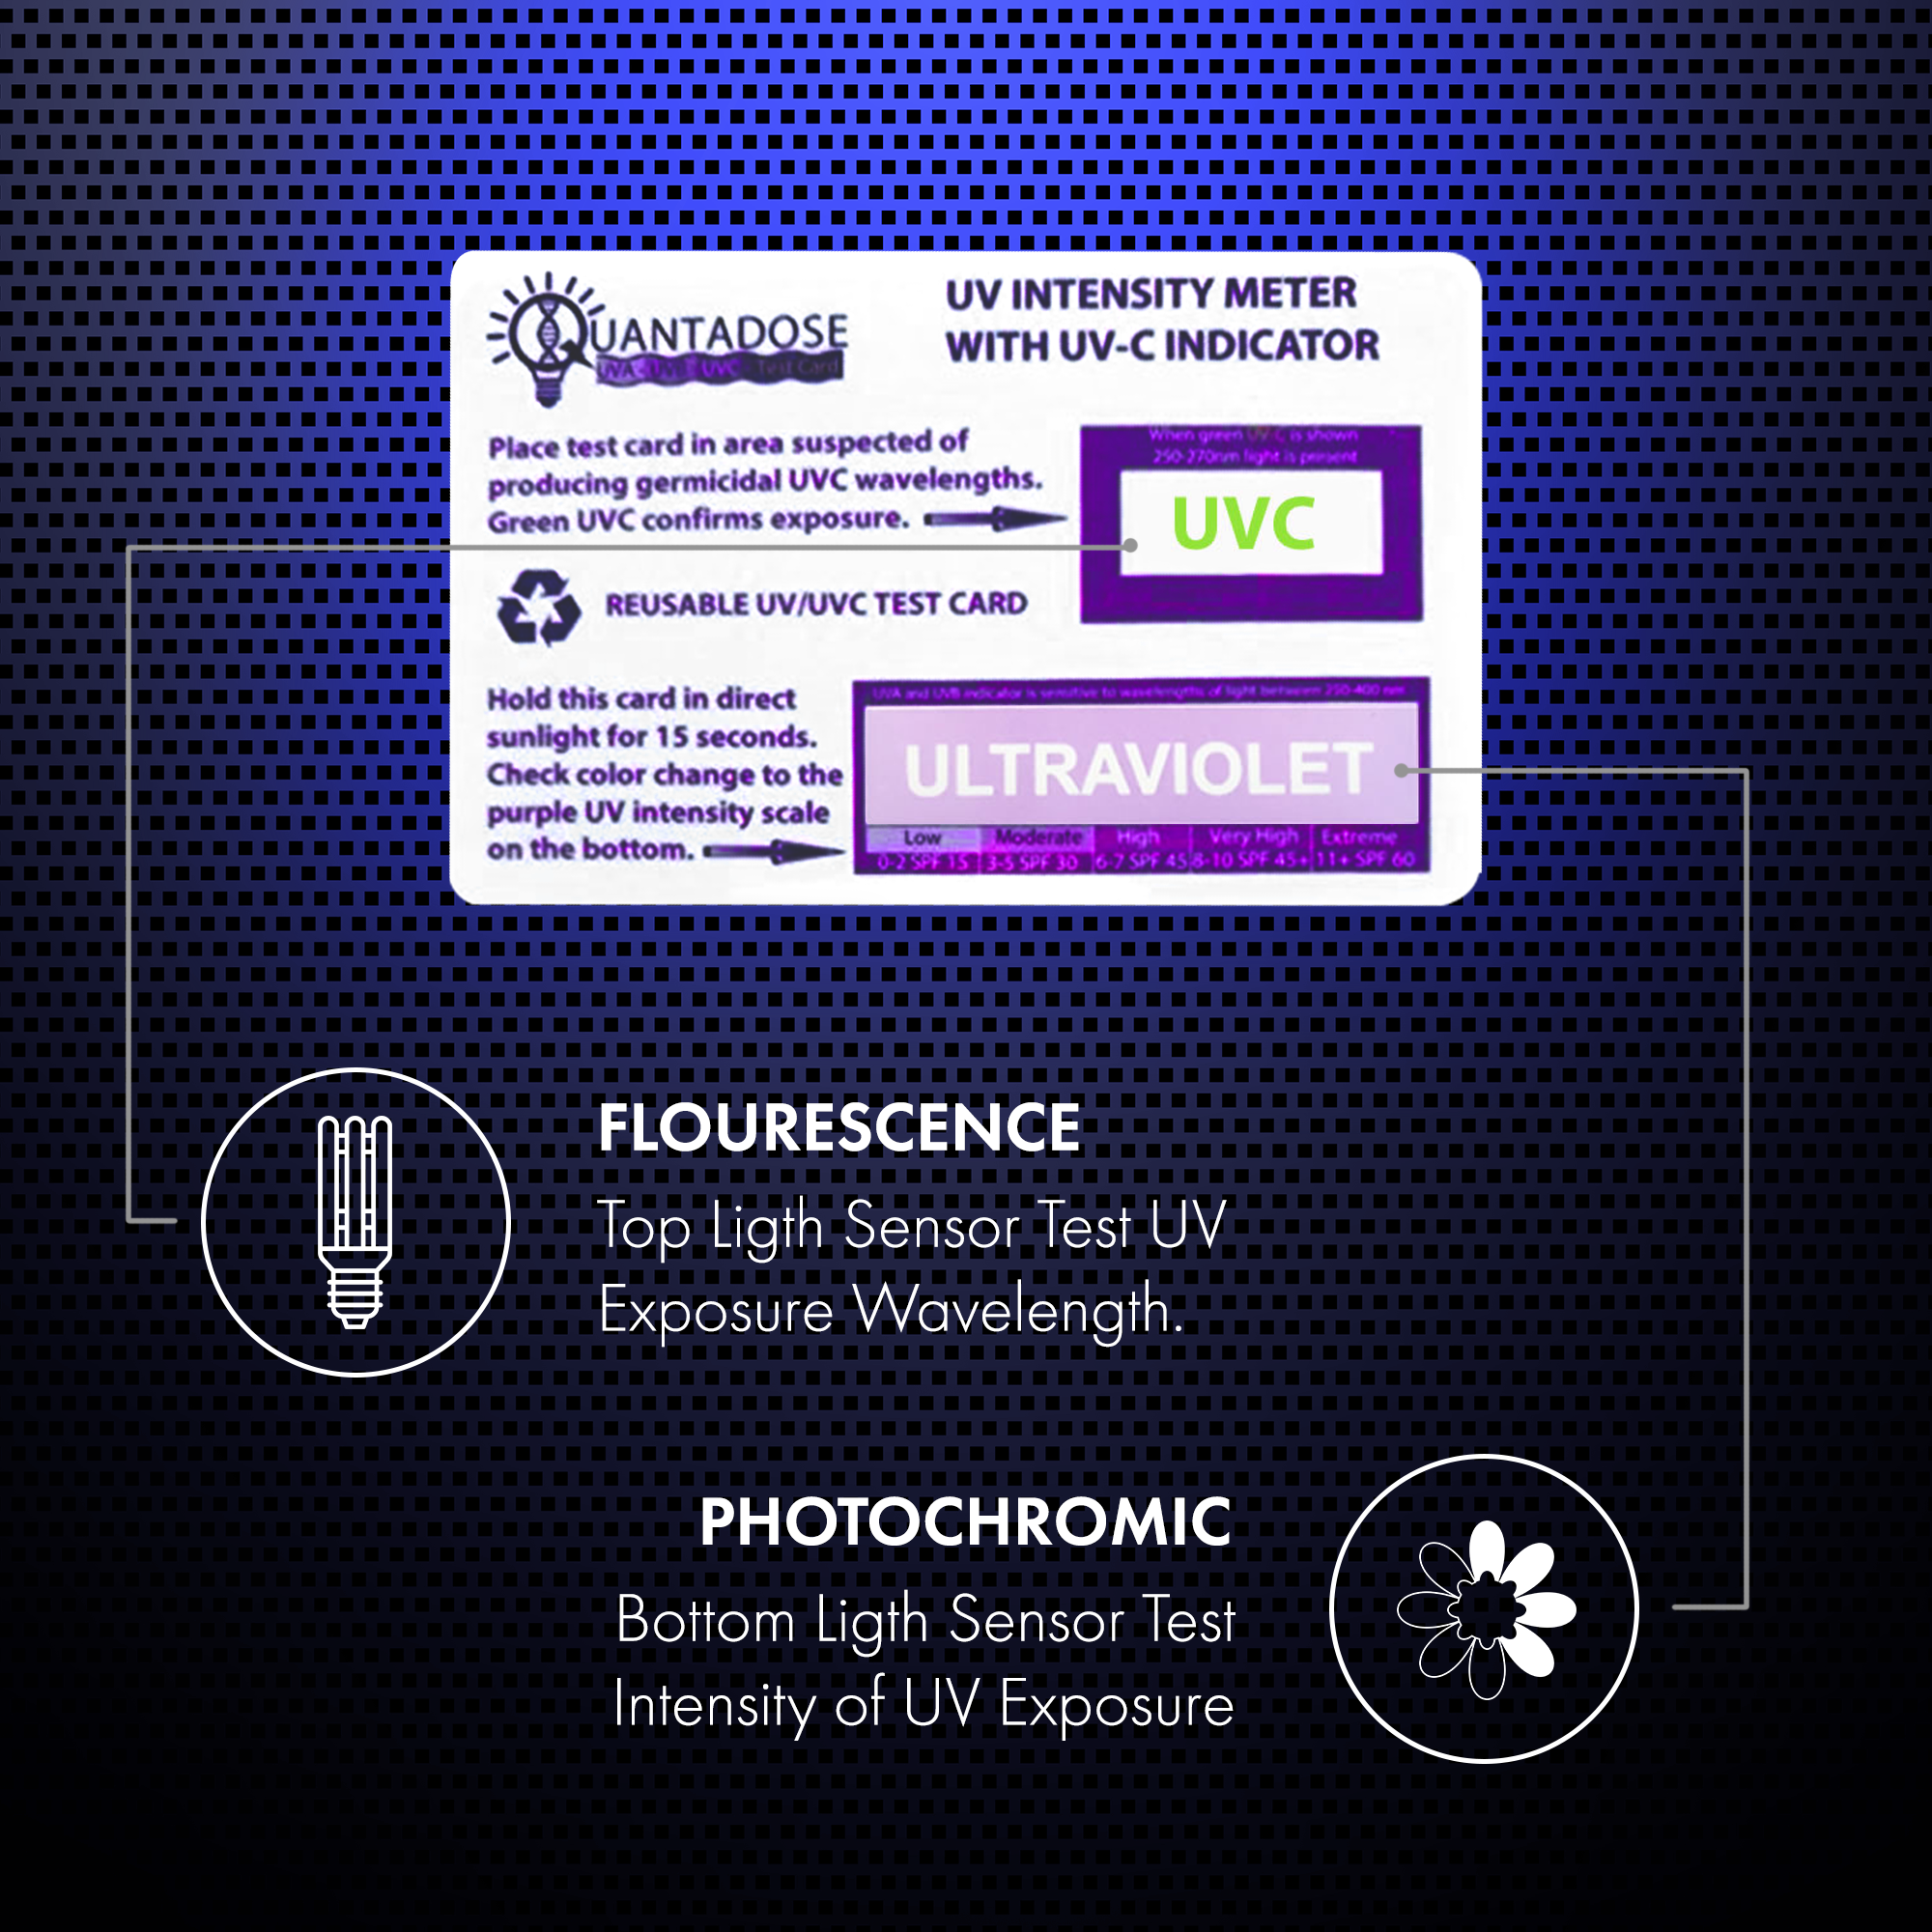 quantadose-uvc-light-test-card-with-uvc-light-wavelength-indicator-product-image-007